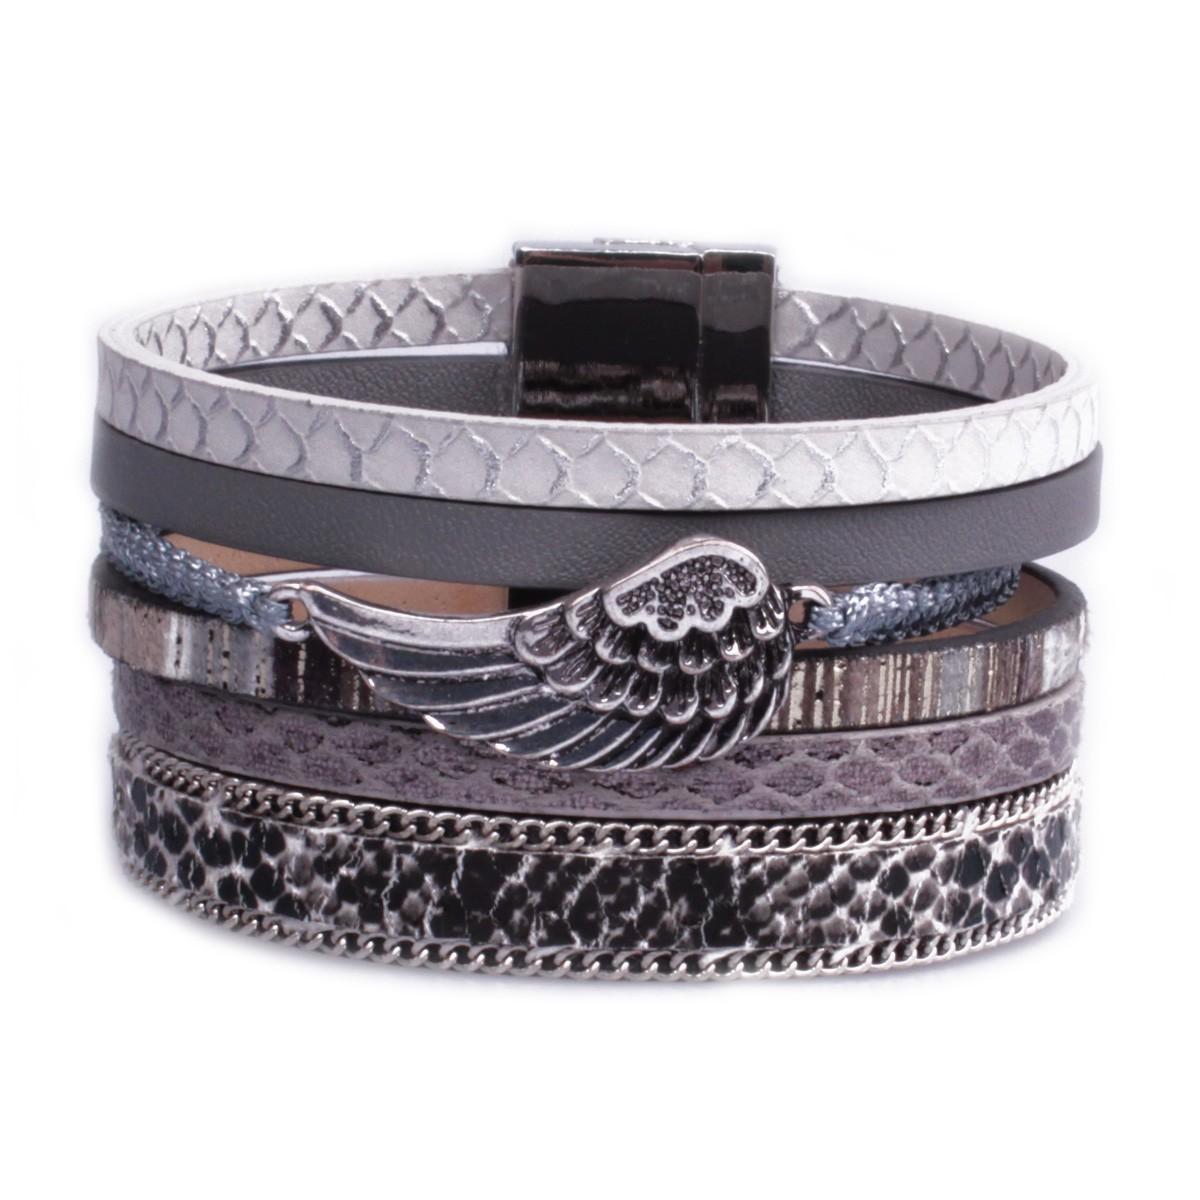 bracelet fantaisie femme manchette aimant strass. Black Bedroom Furniture Sets. Home Design Ideas